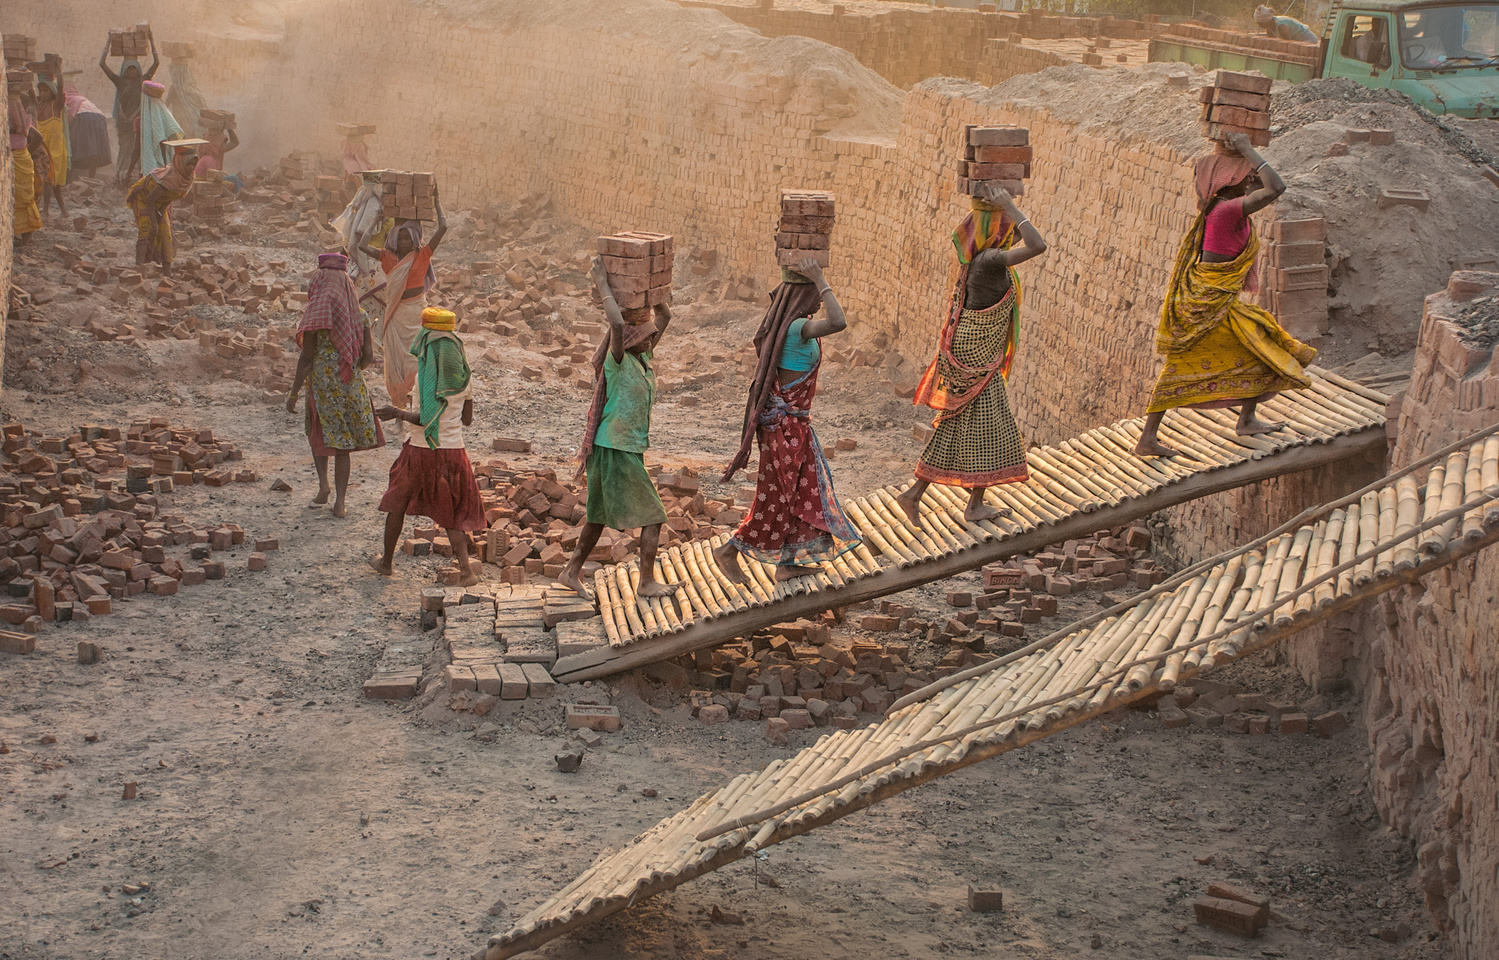 Brick-Kiln-Workers by Chanchal Bose